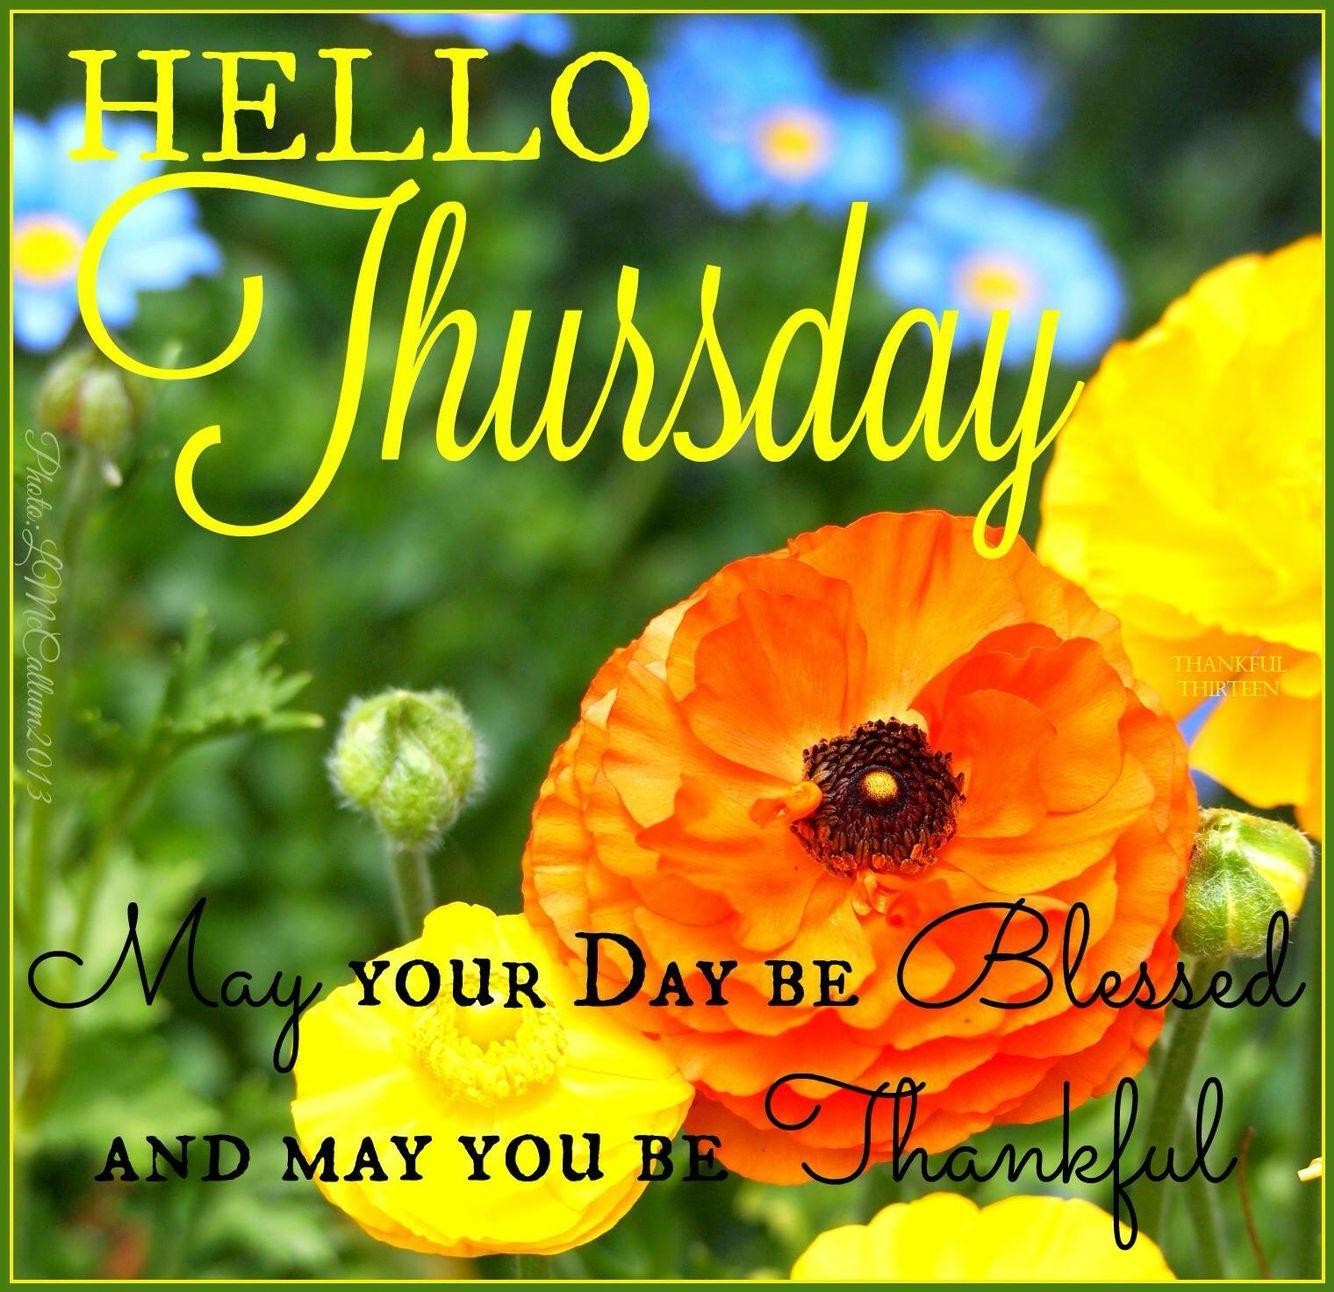 Good Morning Beautiful Thursday Images : Hello thursday may your day be blessed good morning